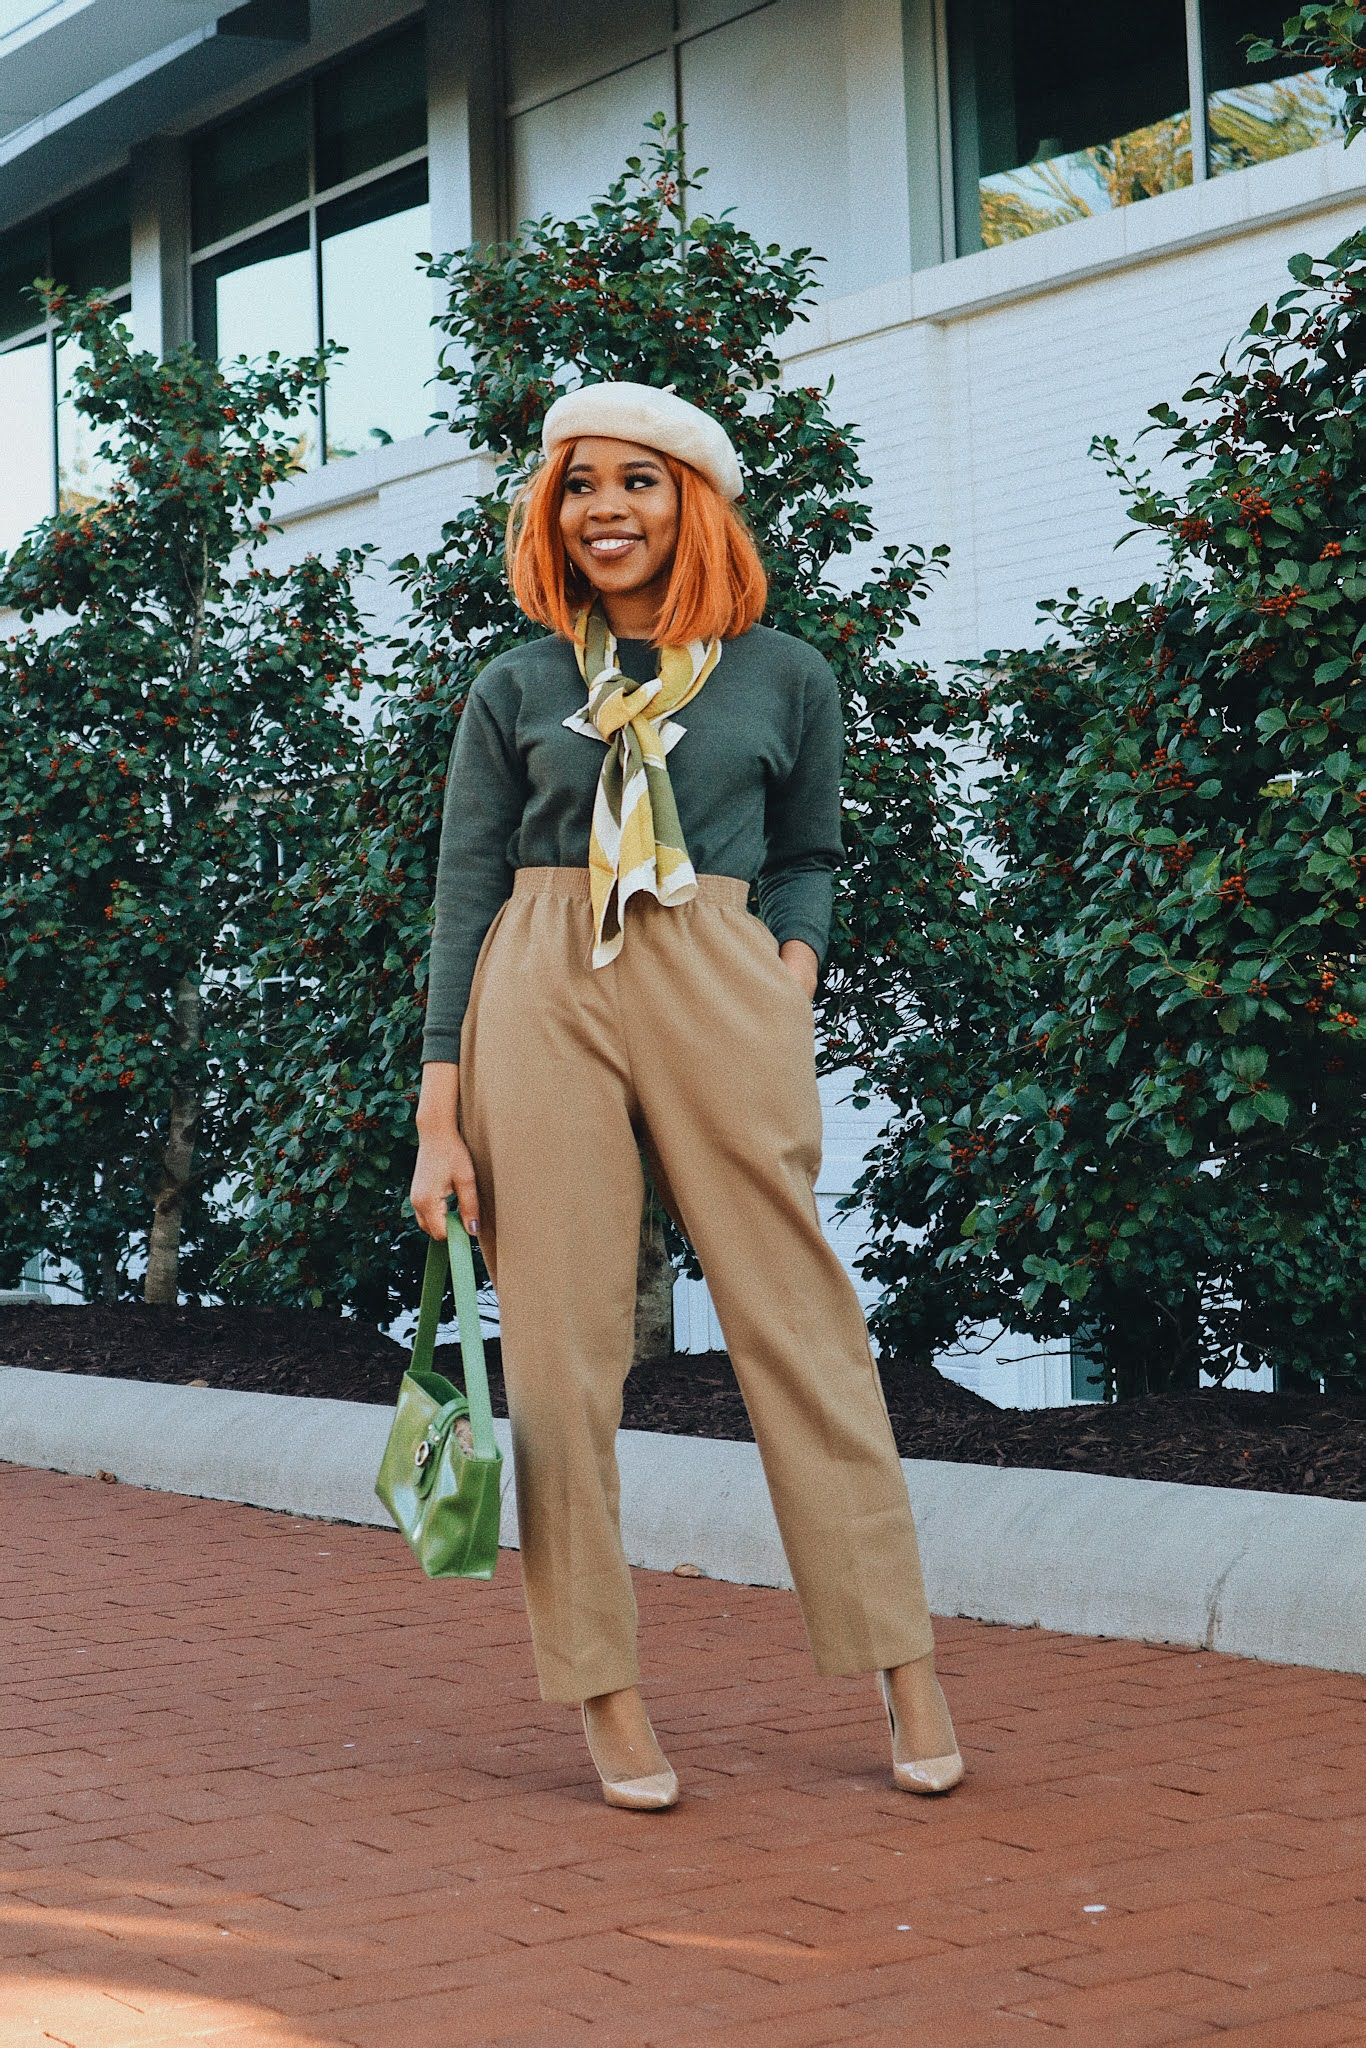 BLACK GIRL FRENCH STREET STYLE